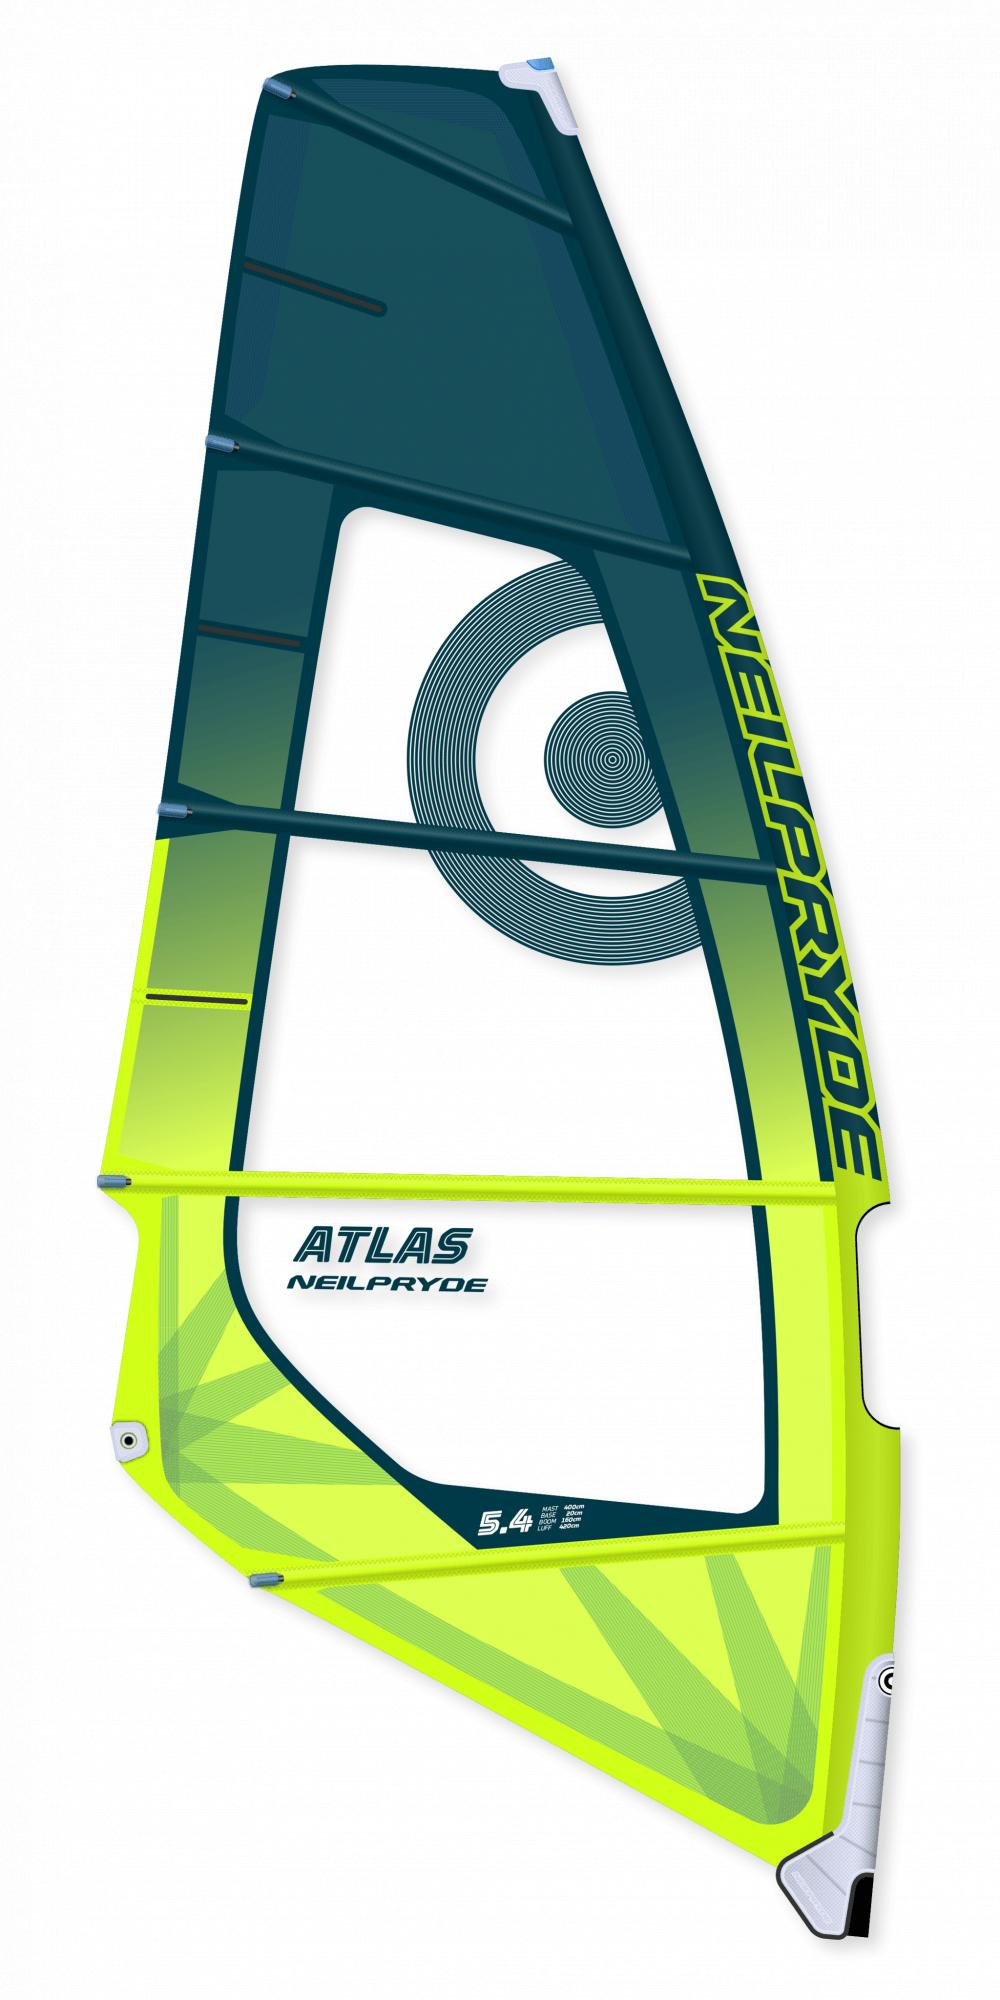 Neilpryde Atlas 2018